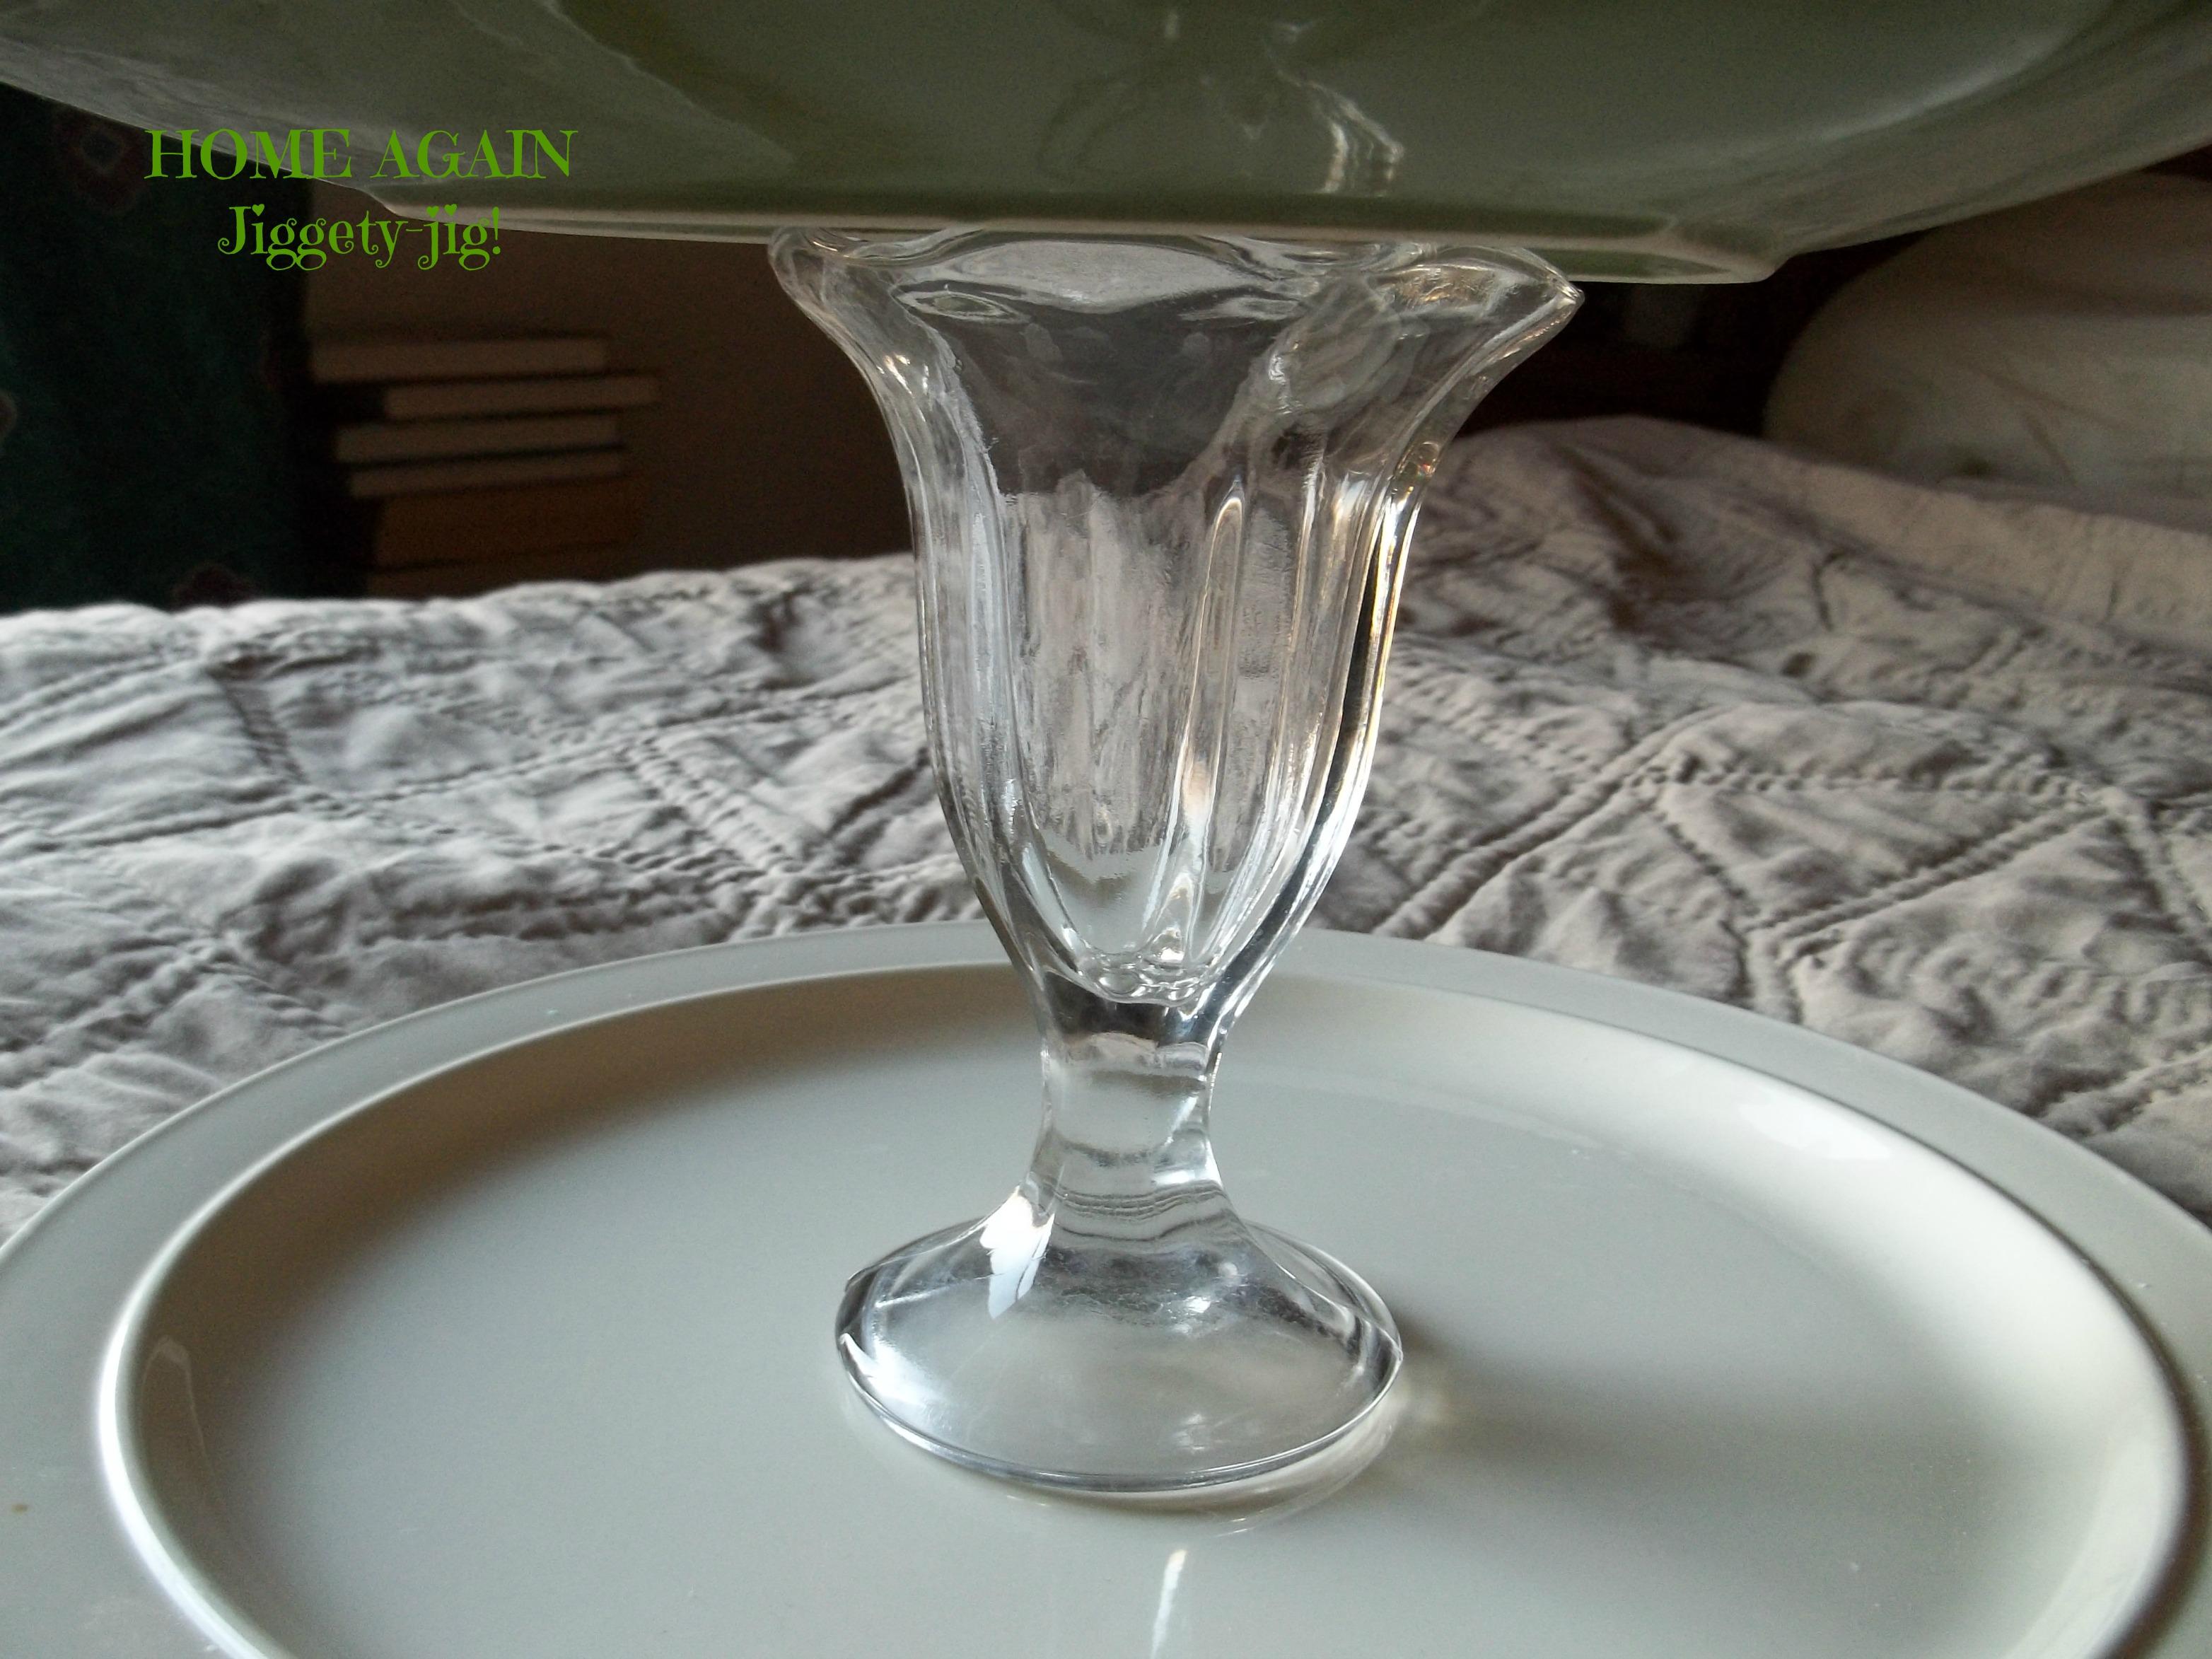 Set up Sundae Cup